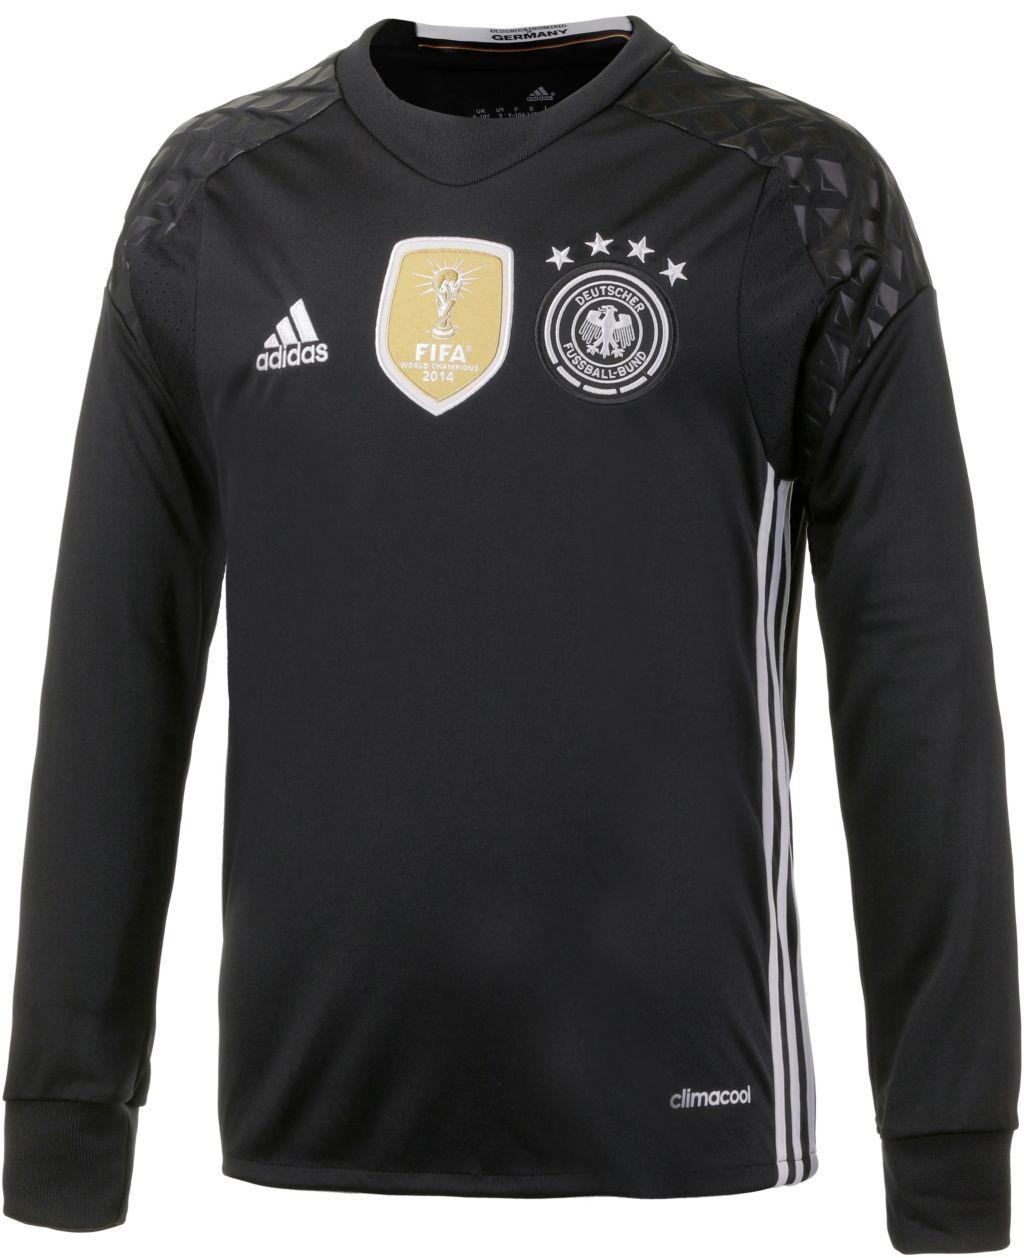 Bild adidas DFB EM 2016 Torwarttrikot Kinder